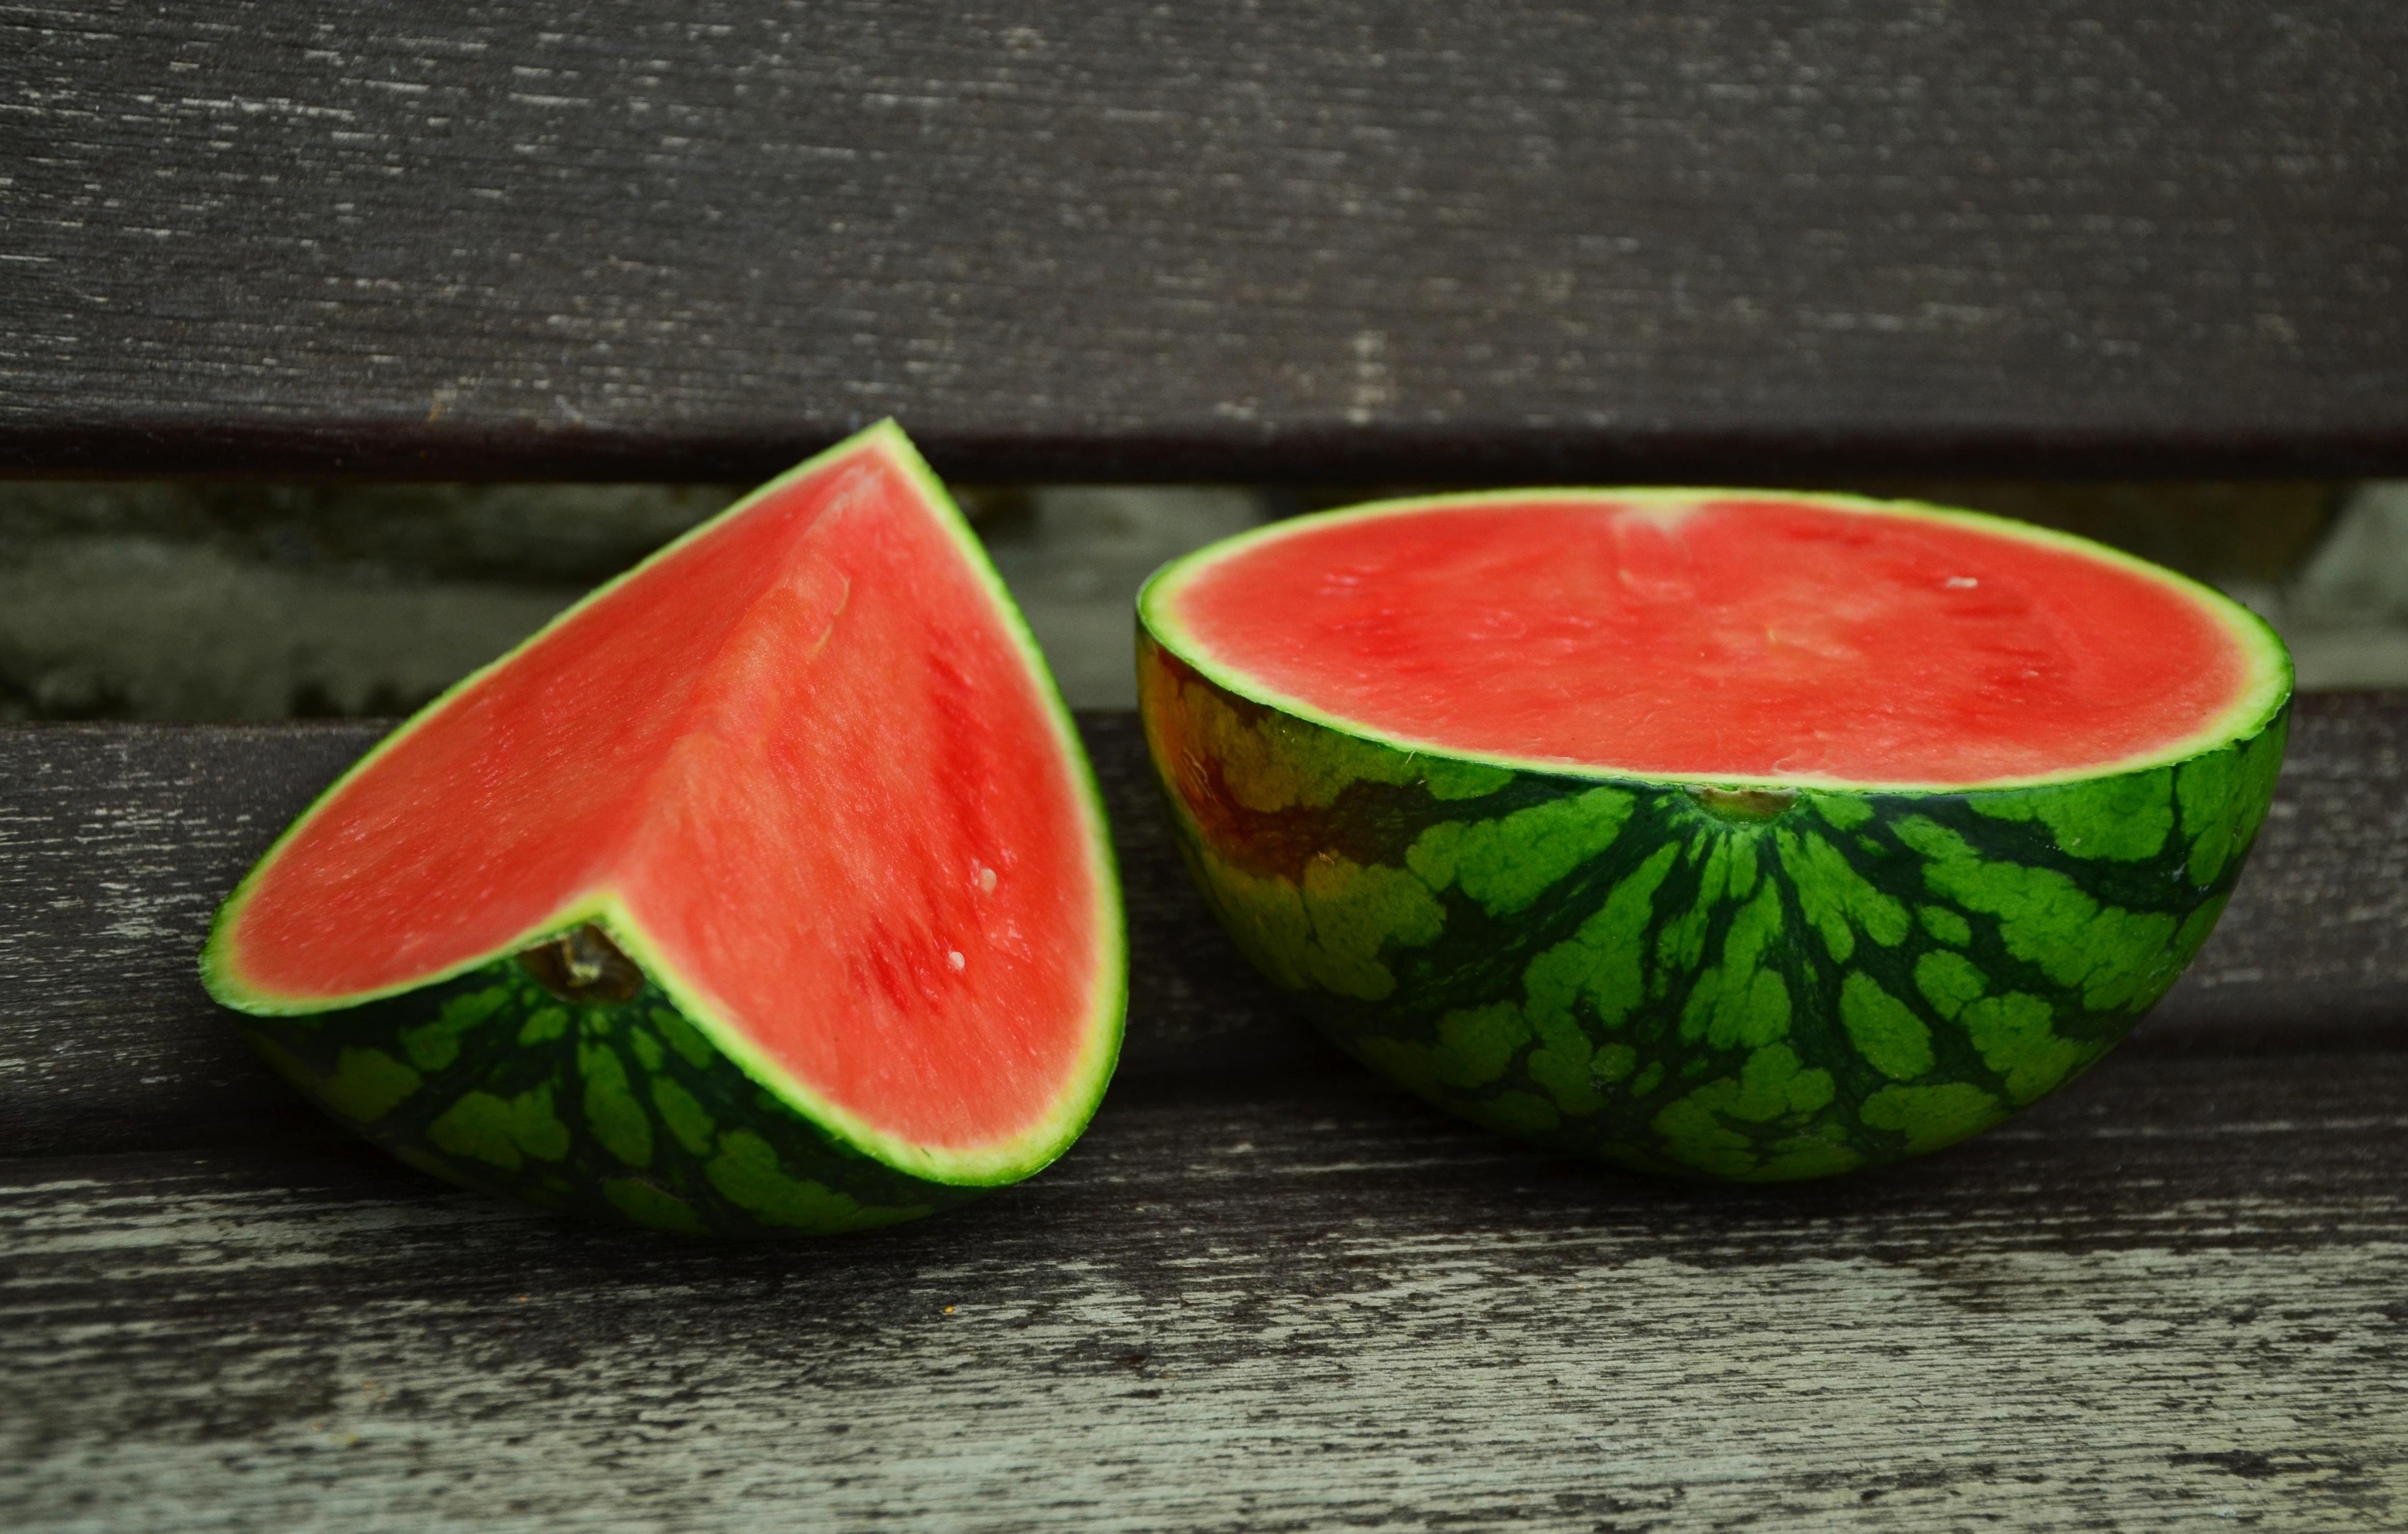 Sliced watermelon photo